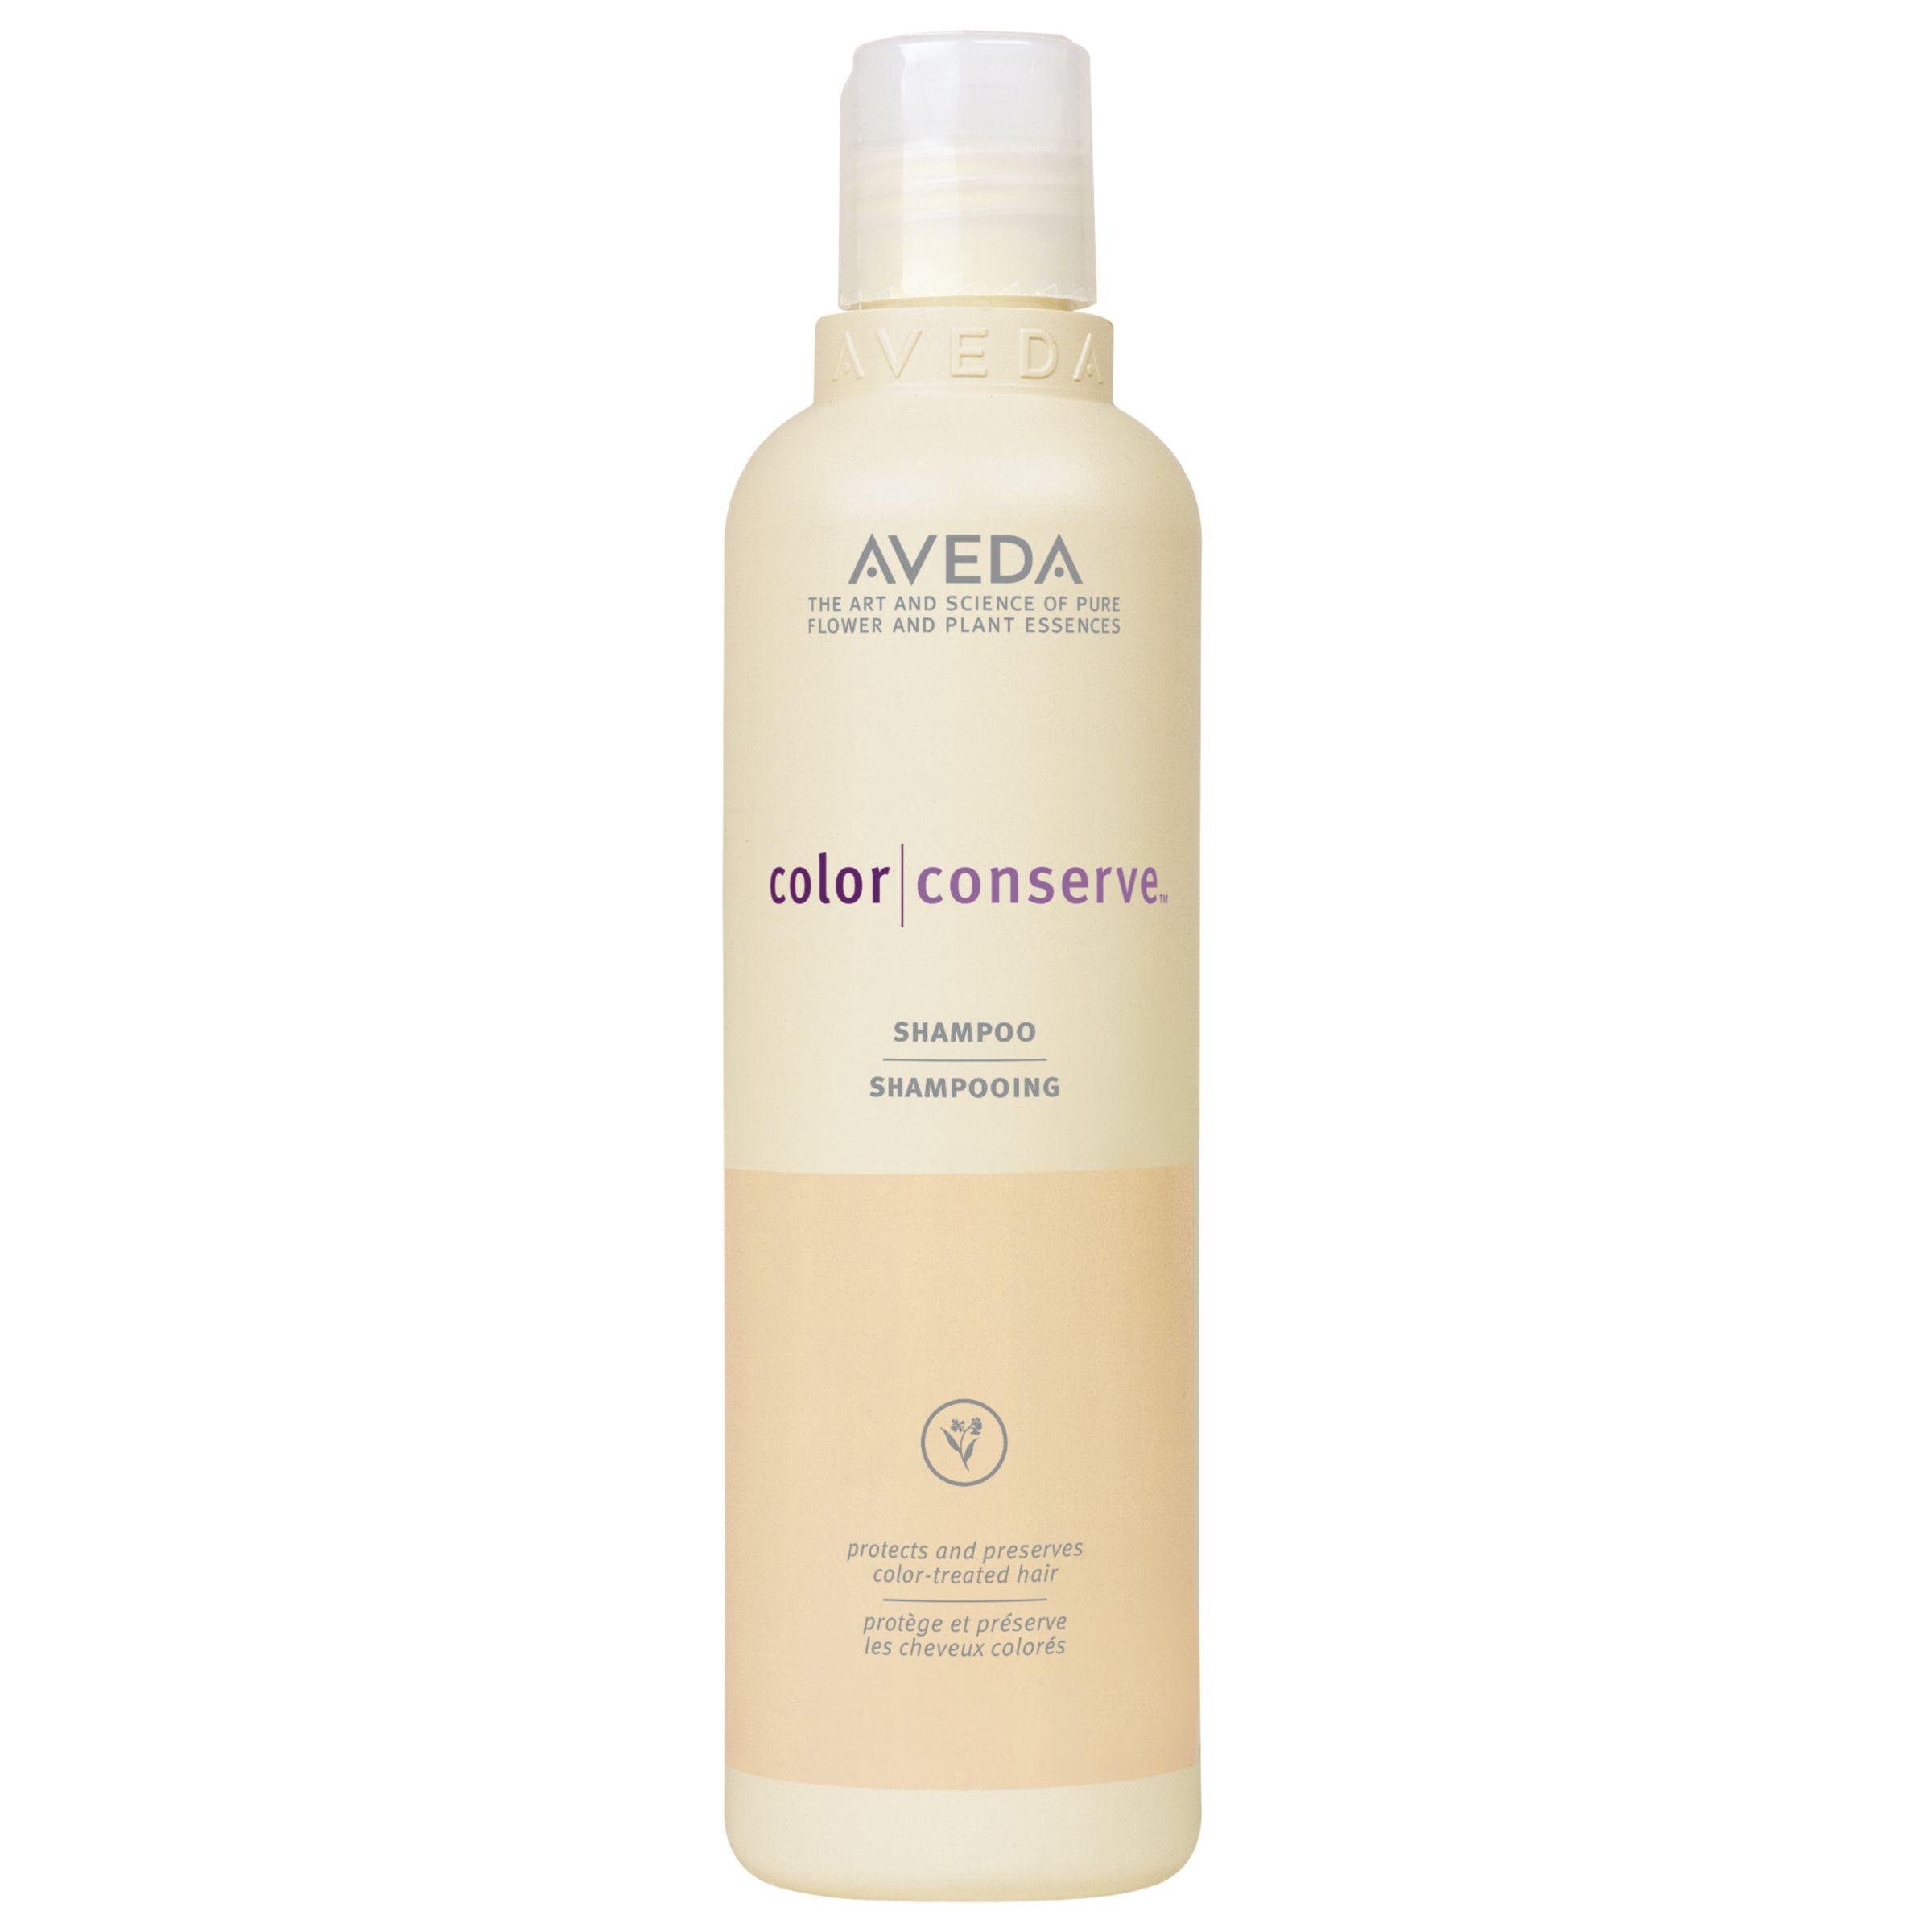 AVEDA Aveda Color Conserve™ Shampoo